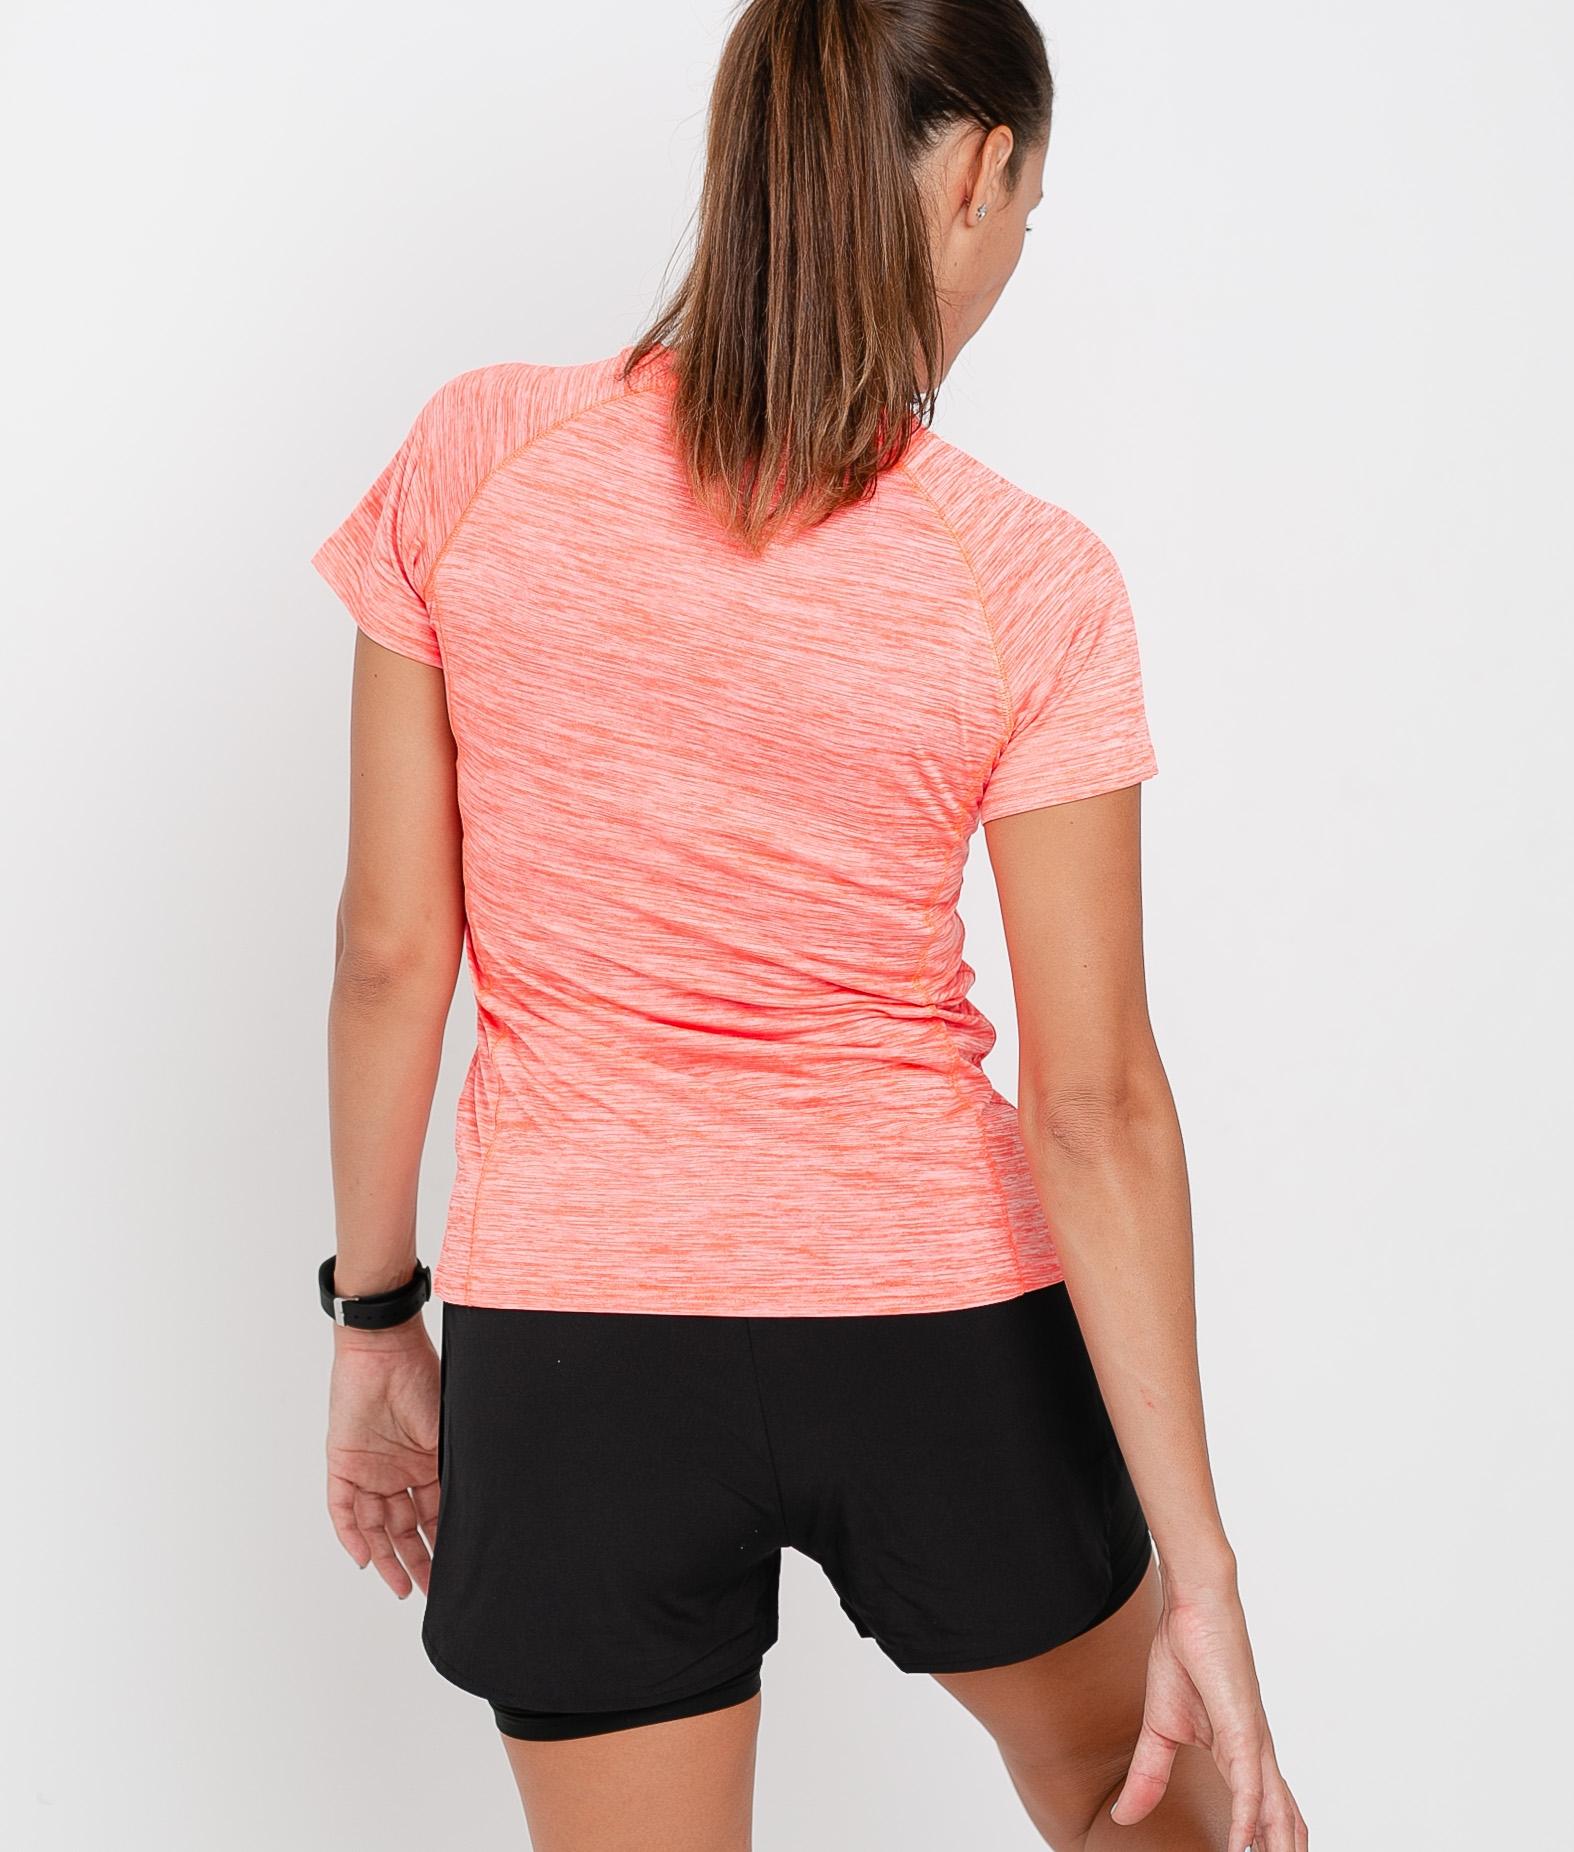 Camiseta Leira - Coral Fluorina